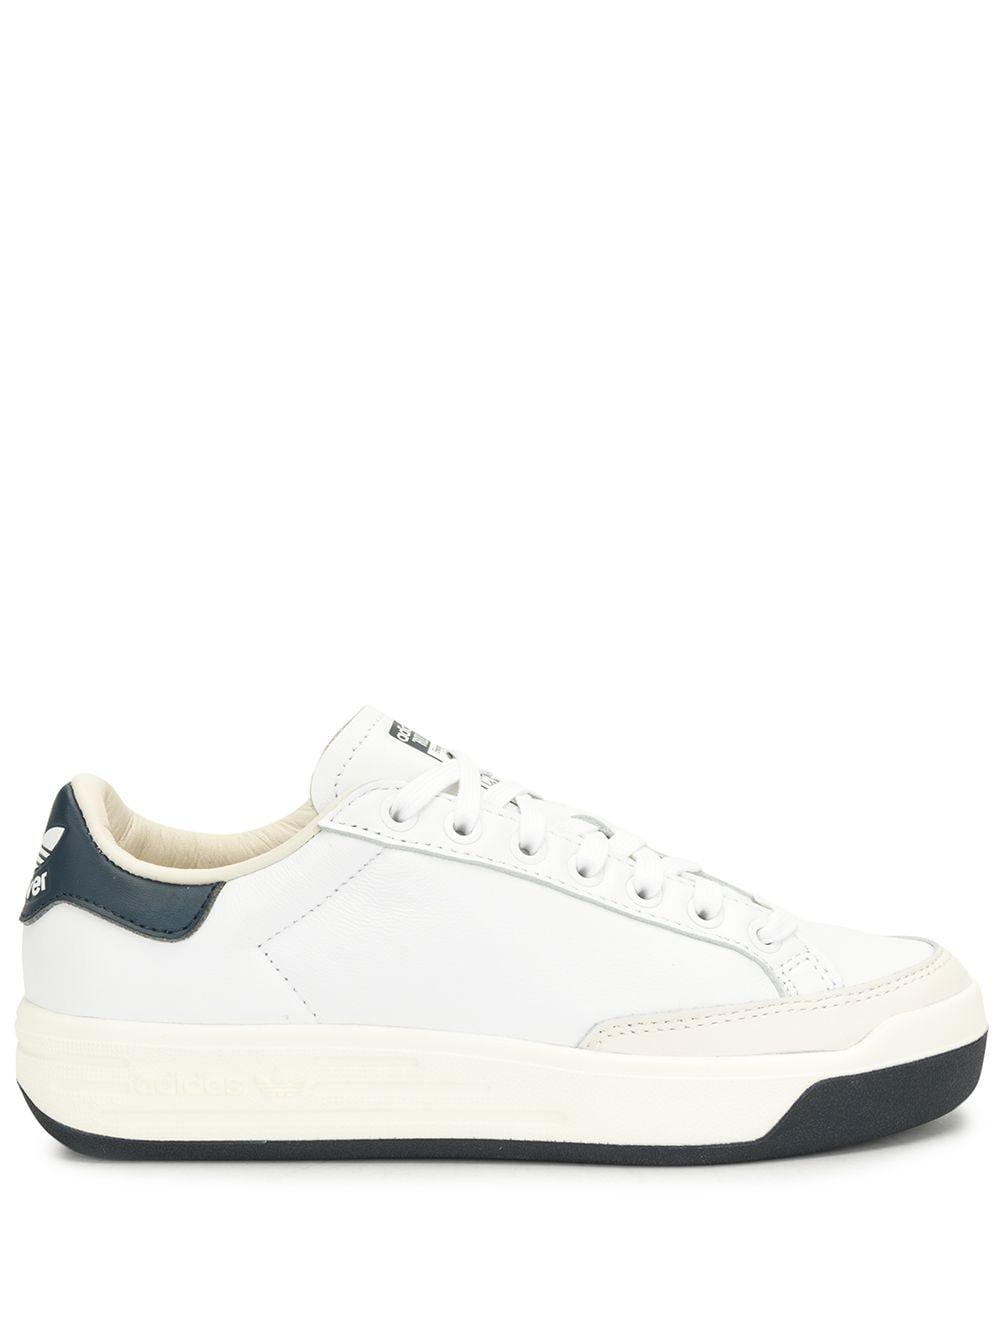 Adidas sneakers rod laver uomo ADIDAS | Sneakers | FX5606FTWR WHITE